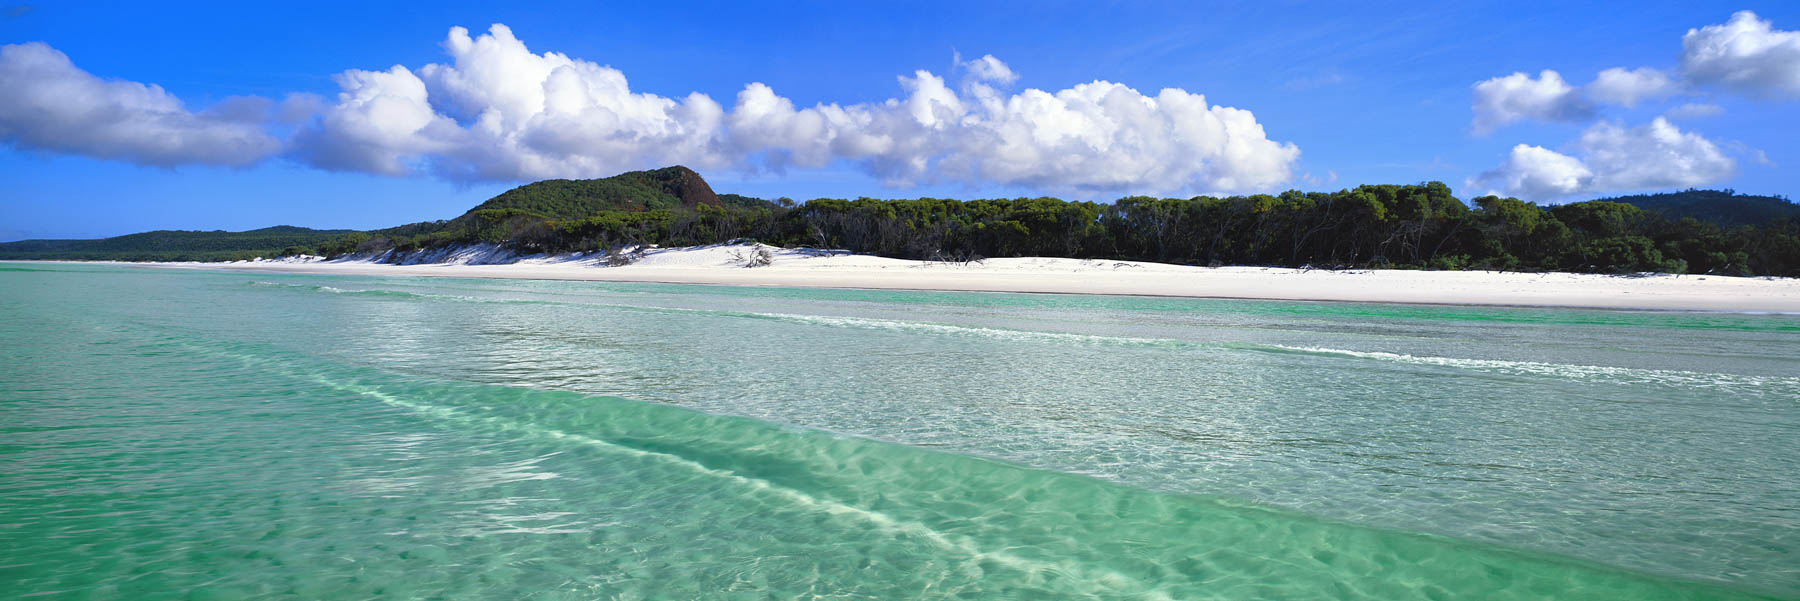 Turquoise water of Whitehaven Beach, Whitsunday Islad, Qld, Australia.